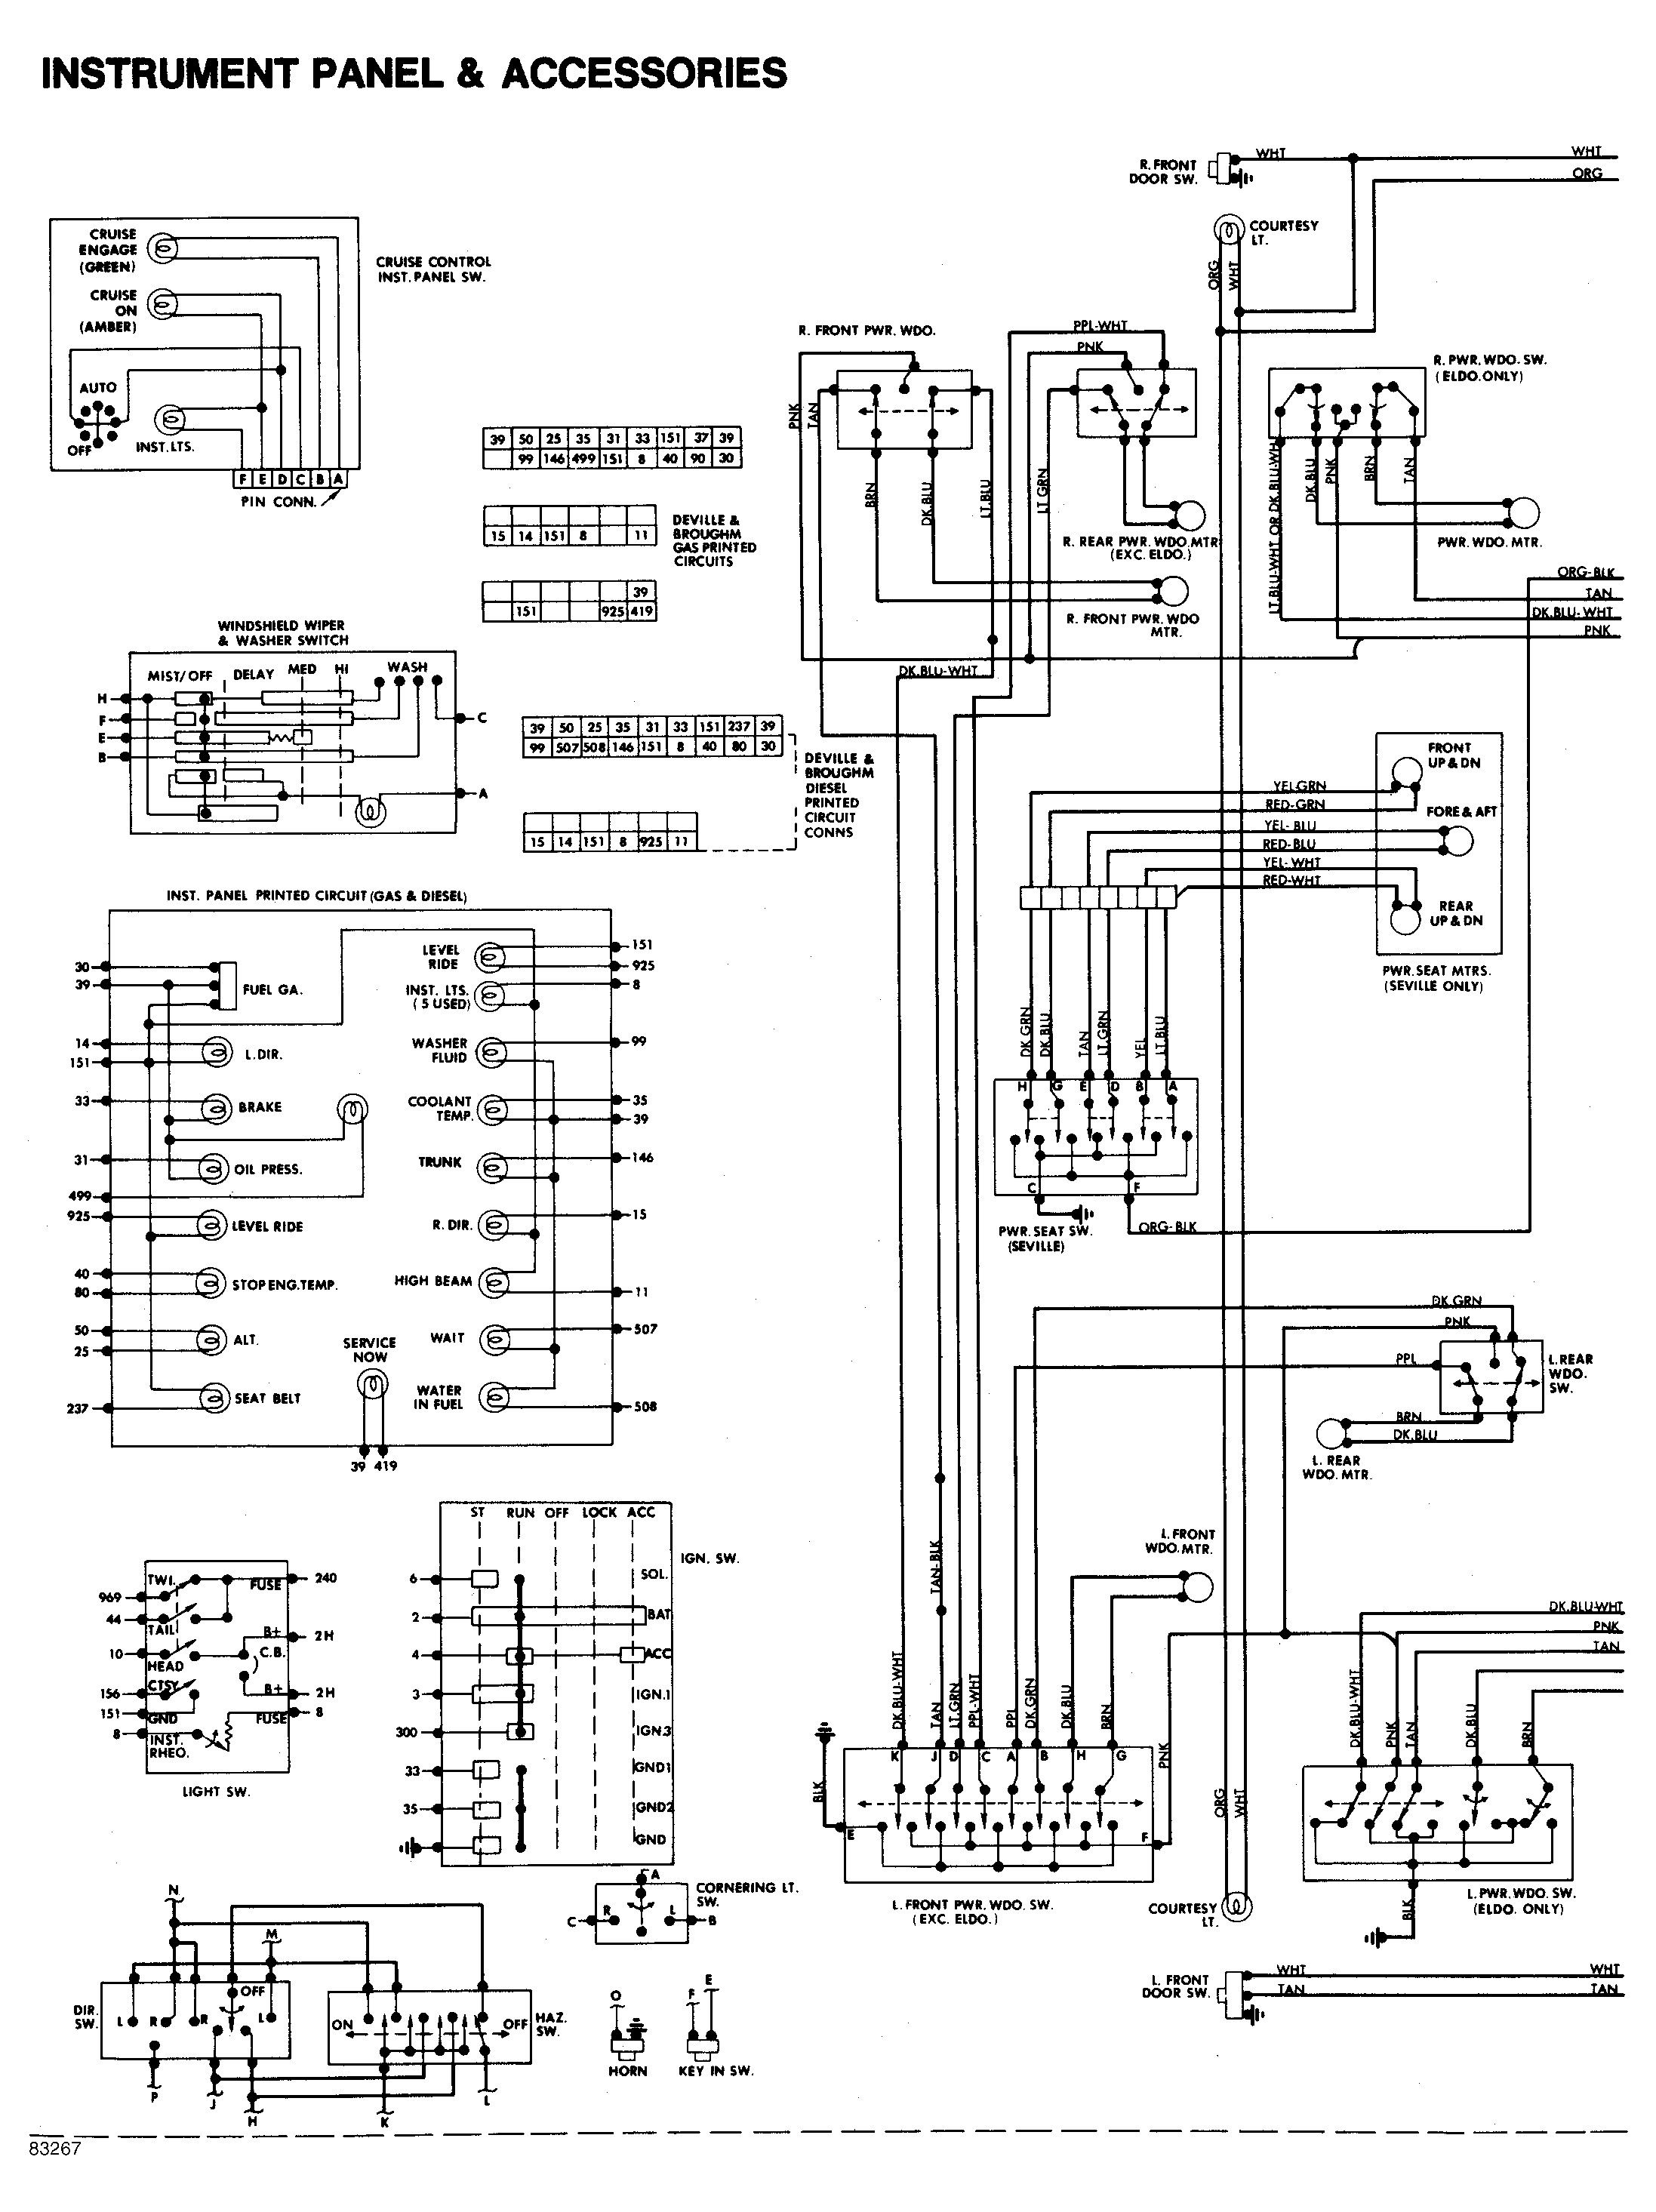 Daewoo Lanos Electrical Wiring Diagram - Data Wiring Diagram ... on ford mustang diagram, kia optima diagram, ford escape diagram, ford maverick diagram, mitsubishi outlander diagram, kia sedona diagram, ford focus diagram, scion xa diagram, ford ranger diagram, mitsubishi eclipse diagram, honda civic diagram, kia sephia diagram, toyota prius diagram, mini moke diagram, honda odyssey diagram, jeep cherokee diagram, audi a4 diagram, mazda 626 diagram, toyota corolla diagram,